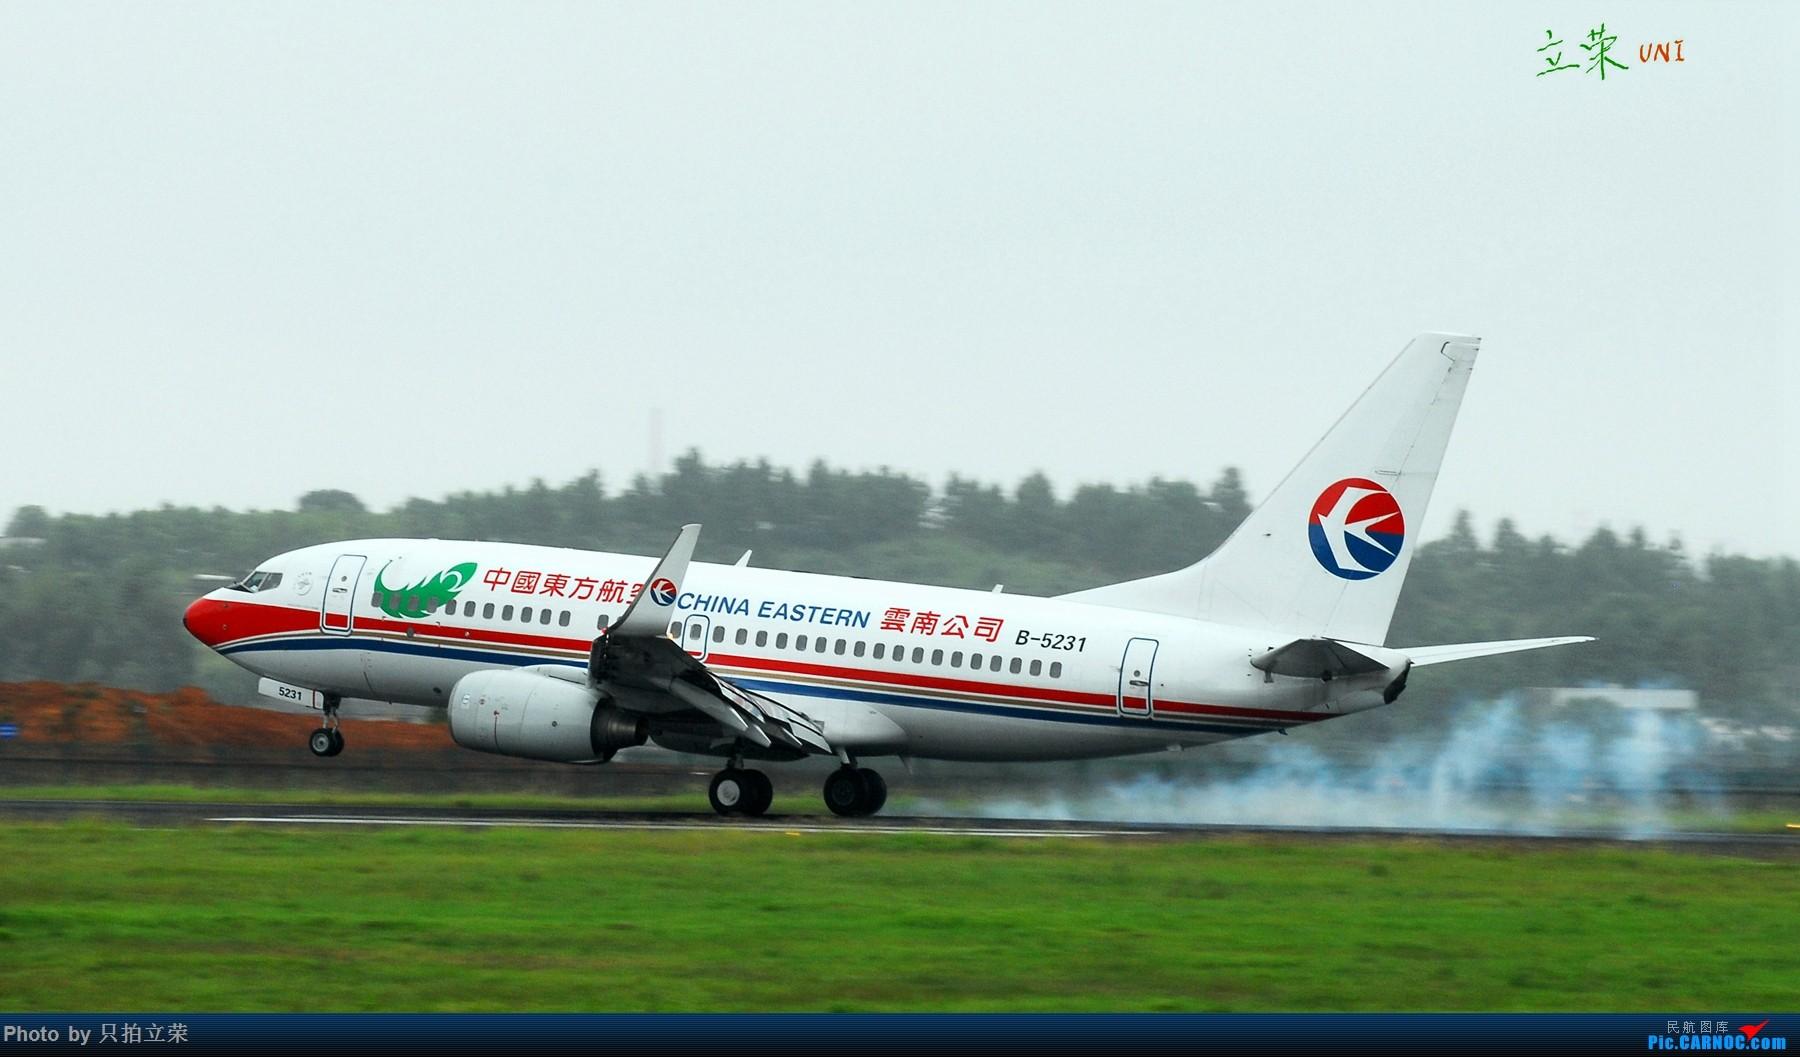 Re:[原创]长沙黄花机场73G/737-700擦烟小集锦 BOEING 737-700 B-5231 中国长沙黄花国际机场